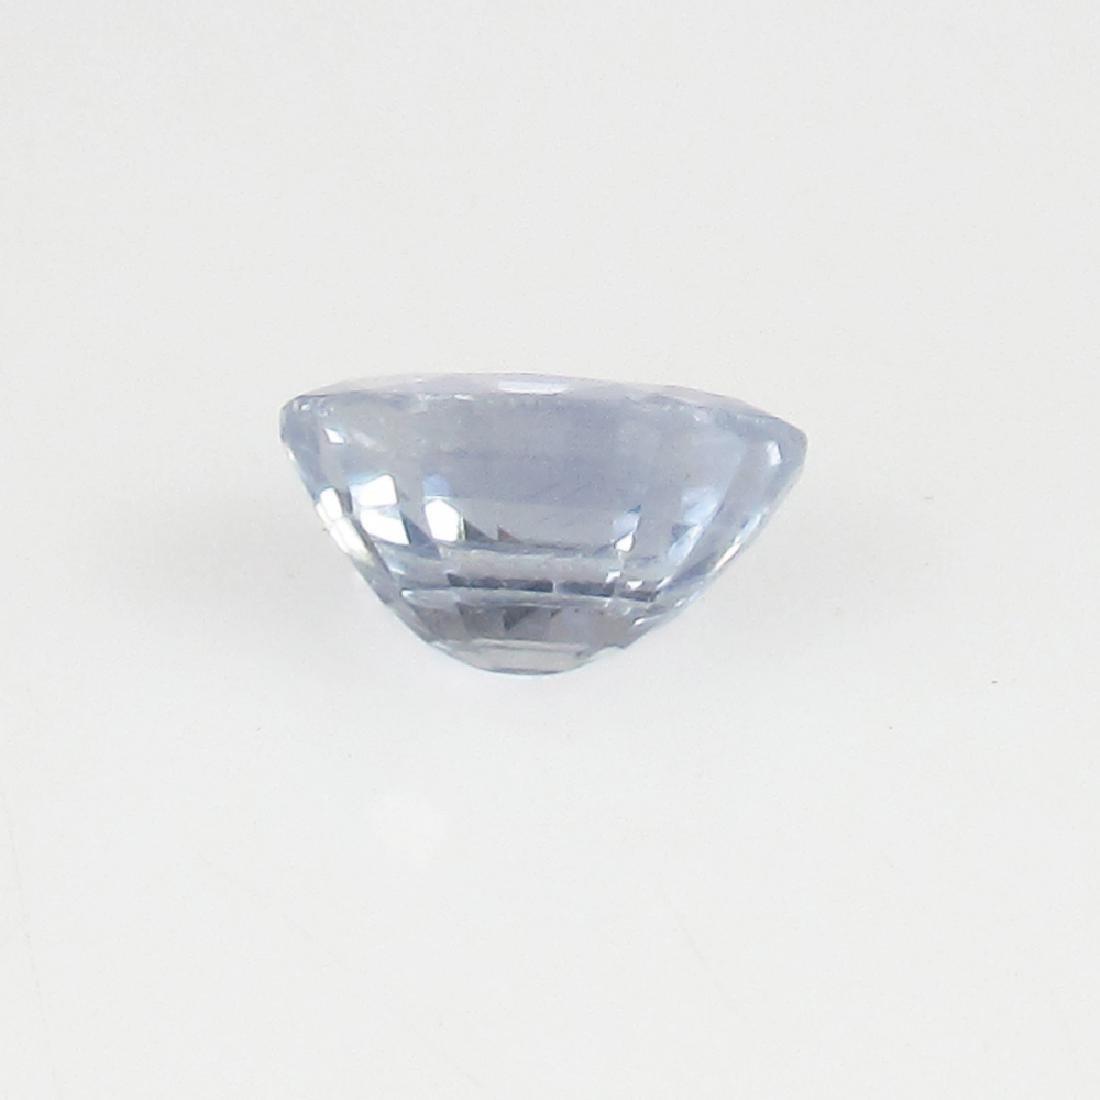 IGI Certified 0.86 Ct Genuine Unheated Sri Lankan Blue - 6